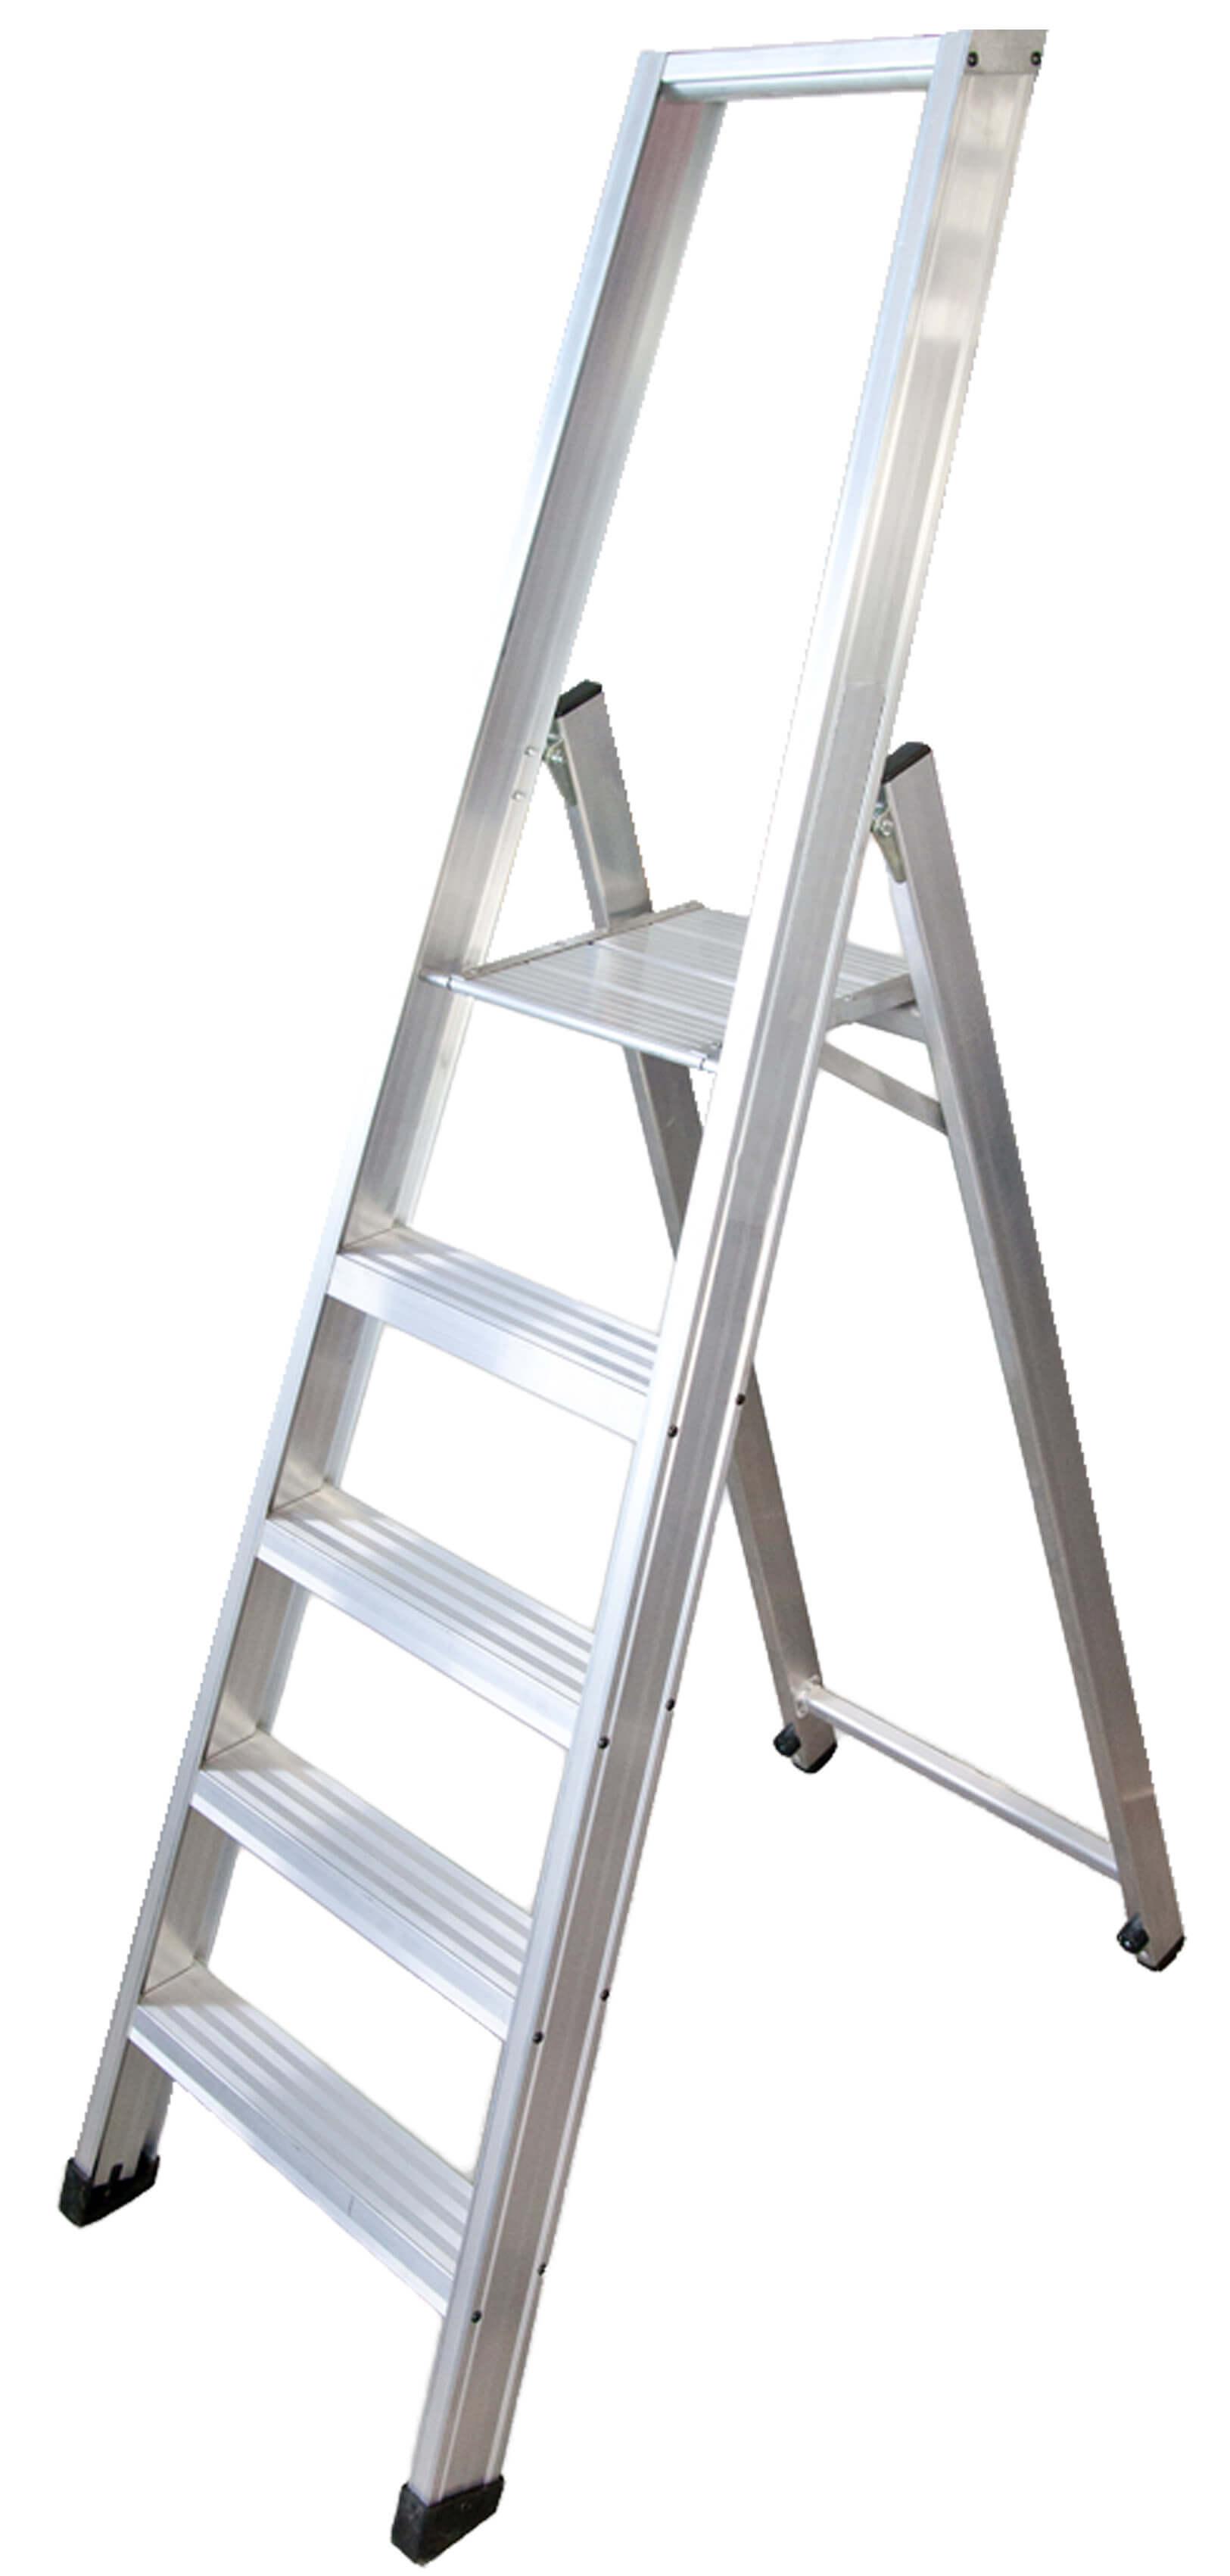 Escalera De Tijera Con Plataforma Modelo Roncal